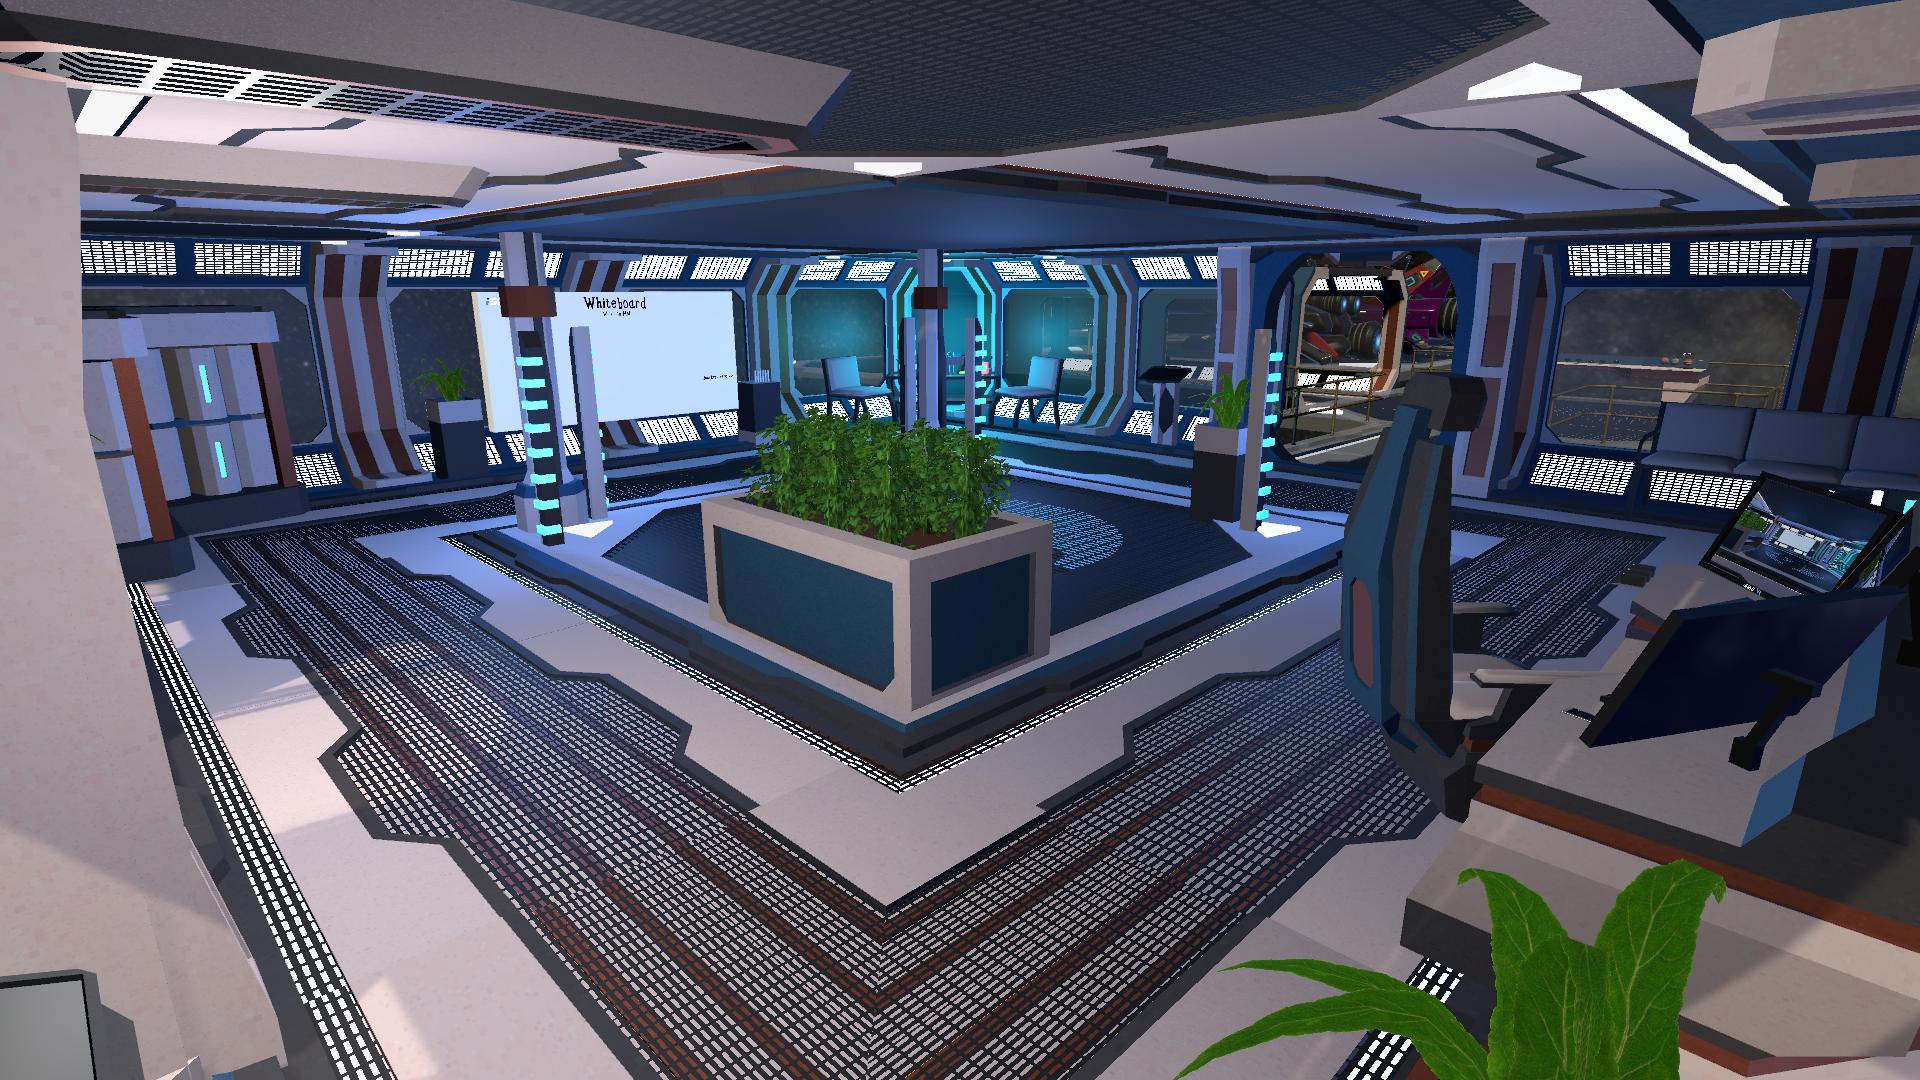 New iSimu VR immersive portal